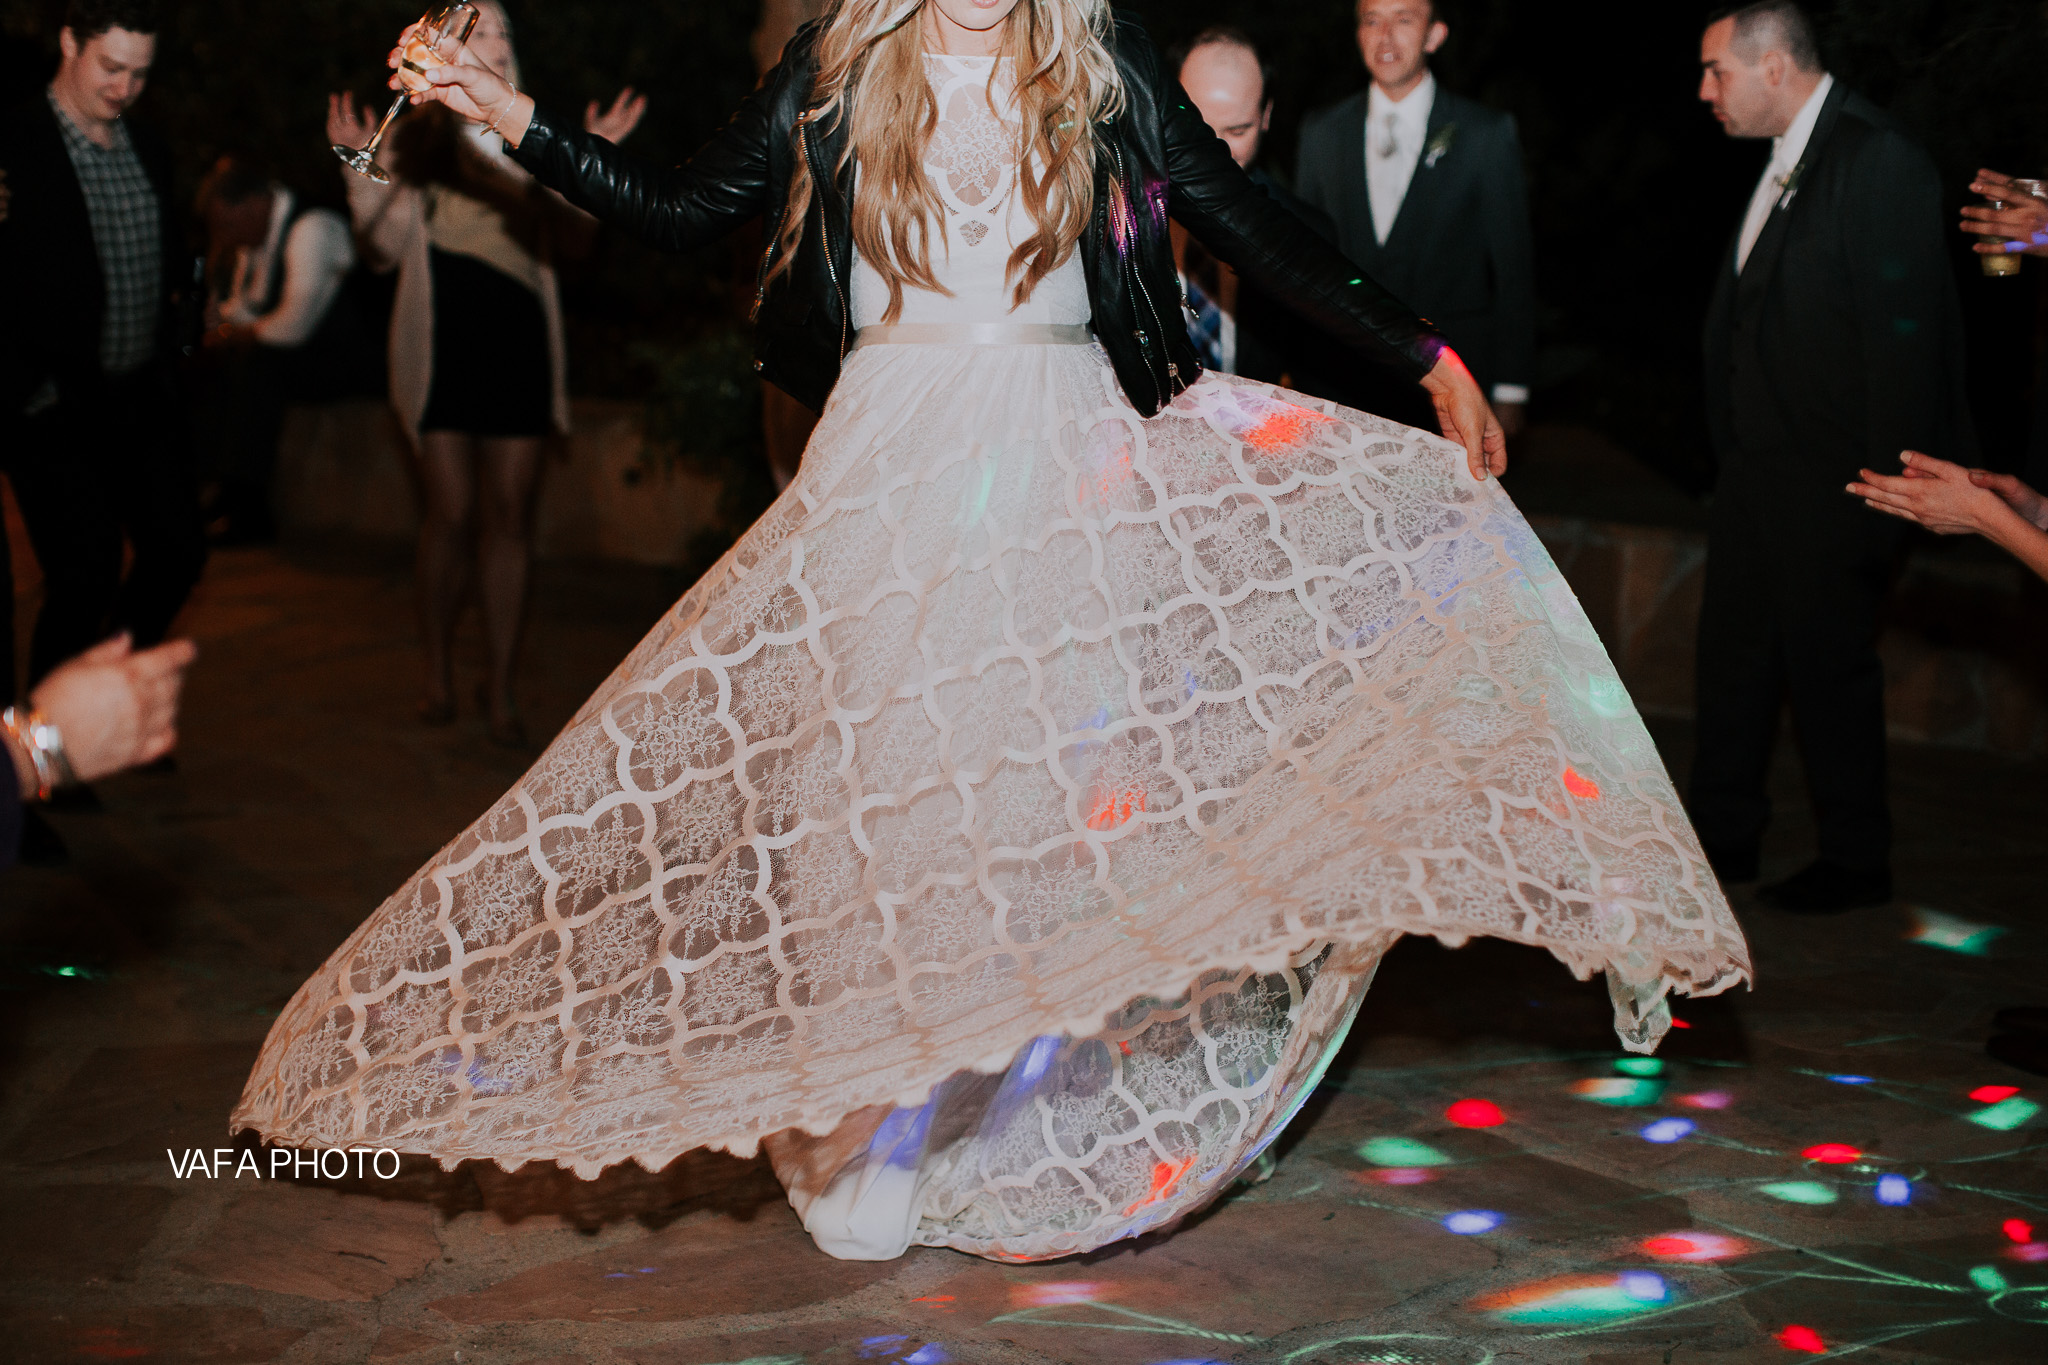 Leo-Carrillo-Ranch-Wedding-Lauren-Mike-Vafa-Photo-1216.jpg